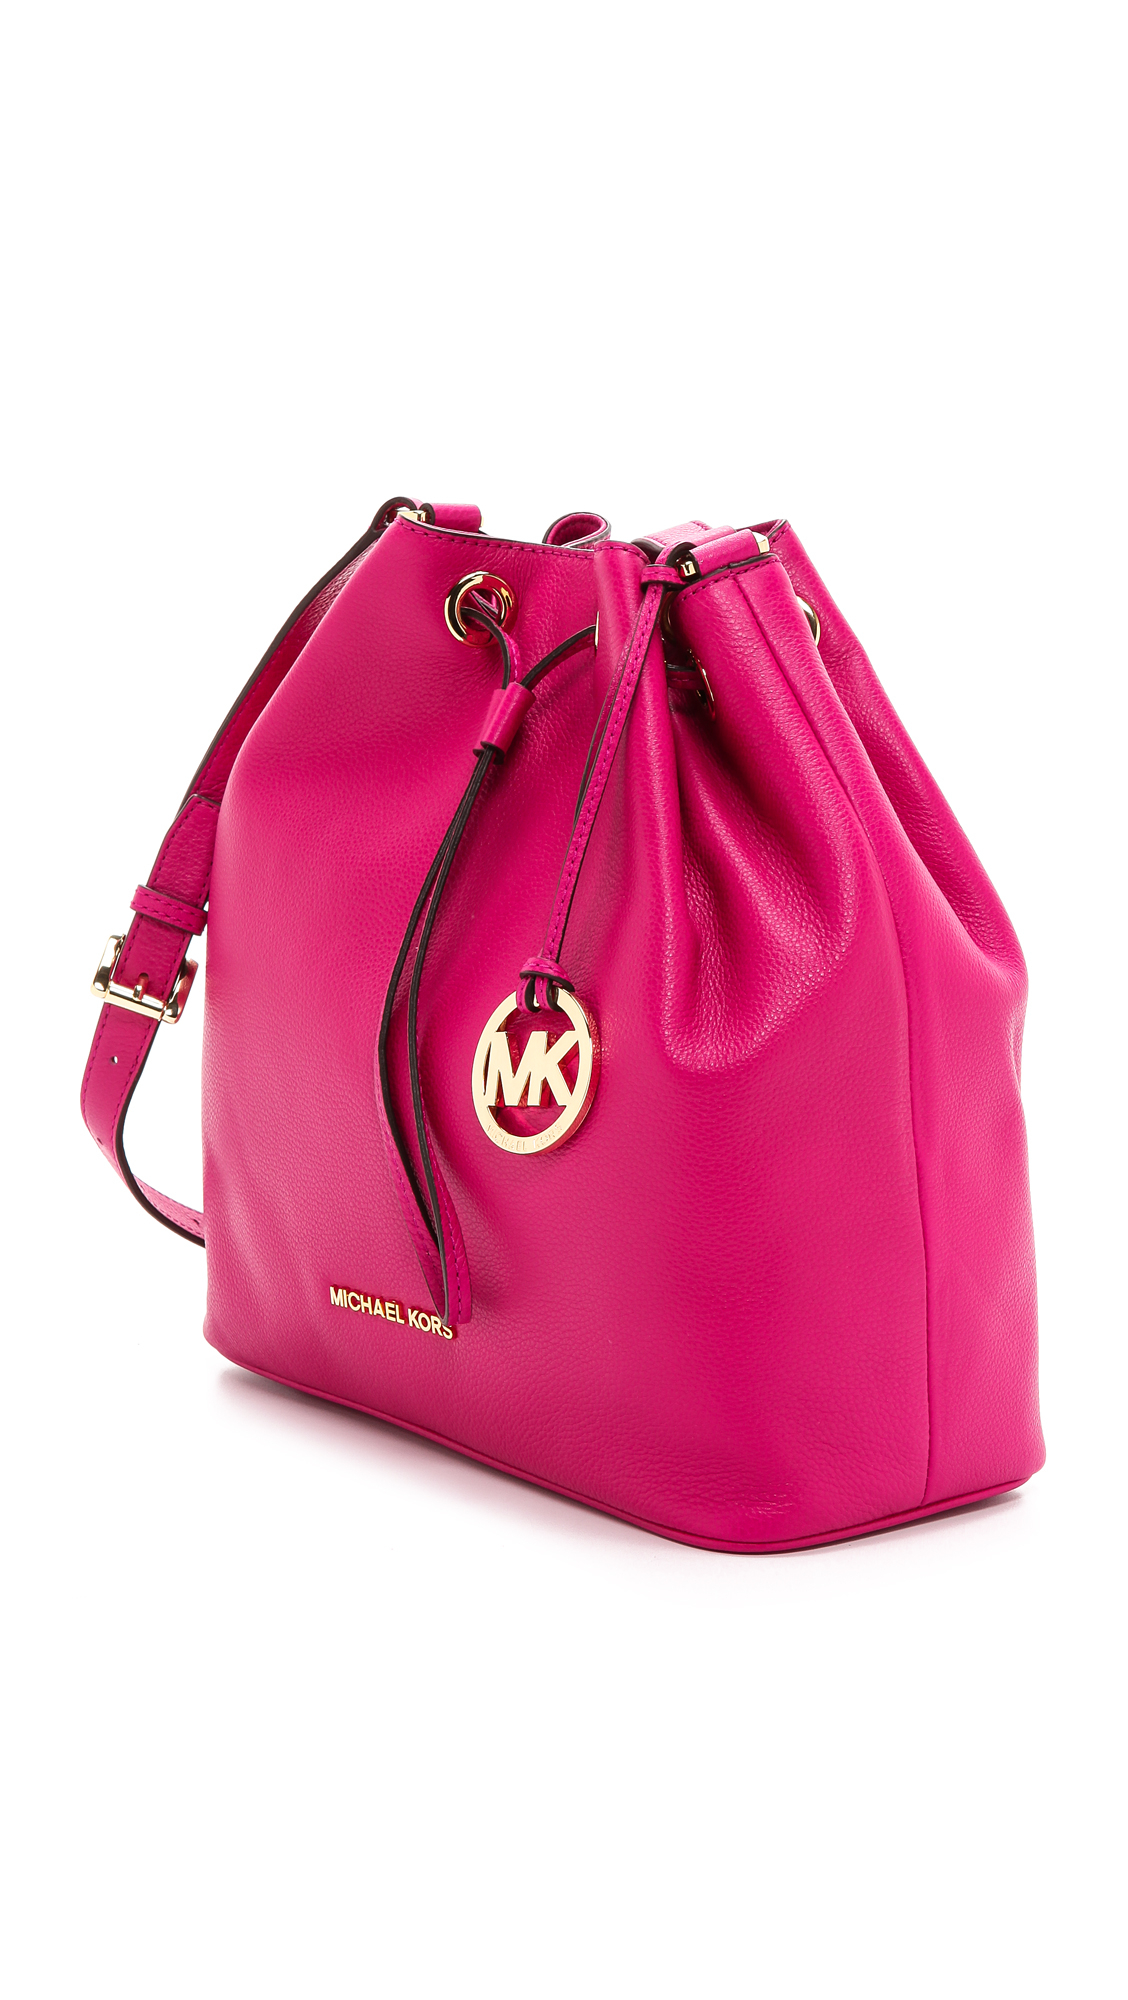 7efc4a4b187cff ... canada lyst michael michael kors jules large drawstring bucket bag  fuschia in pink 6e7fe d2f56